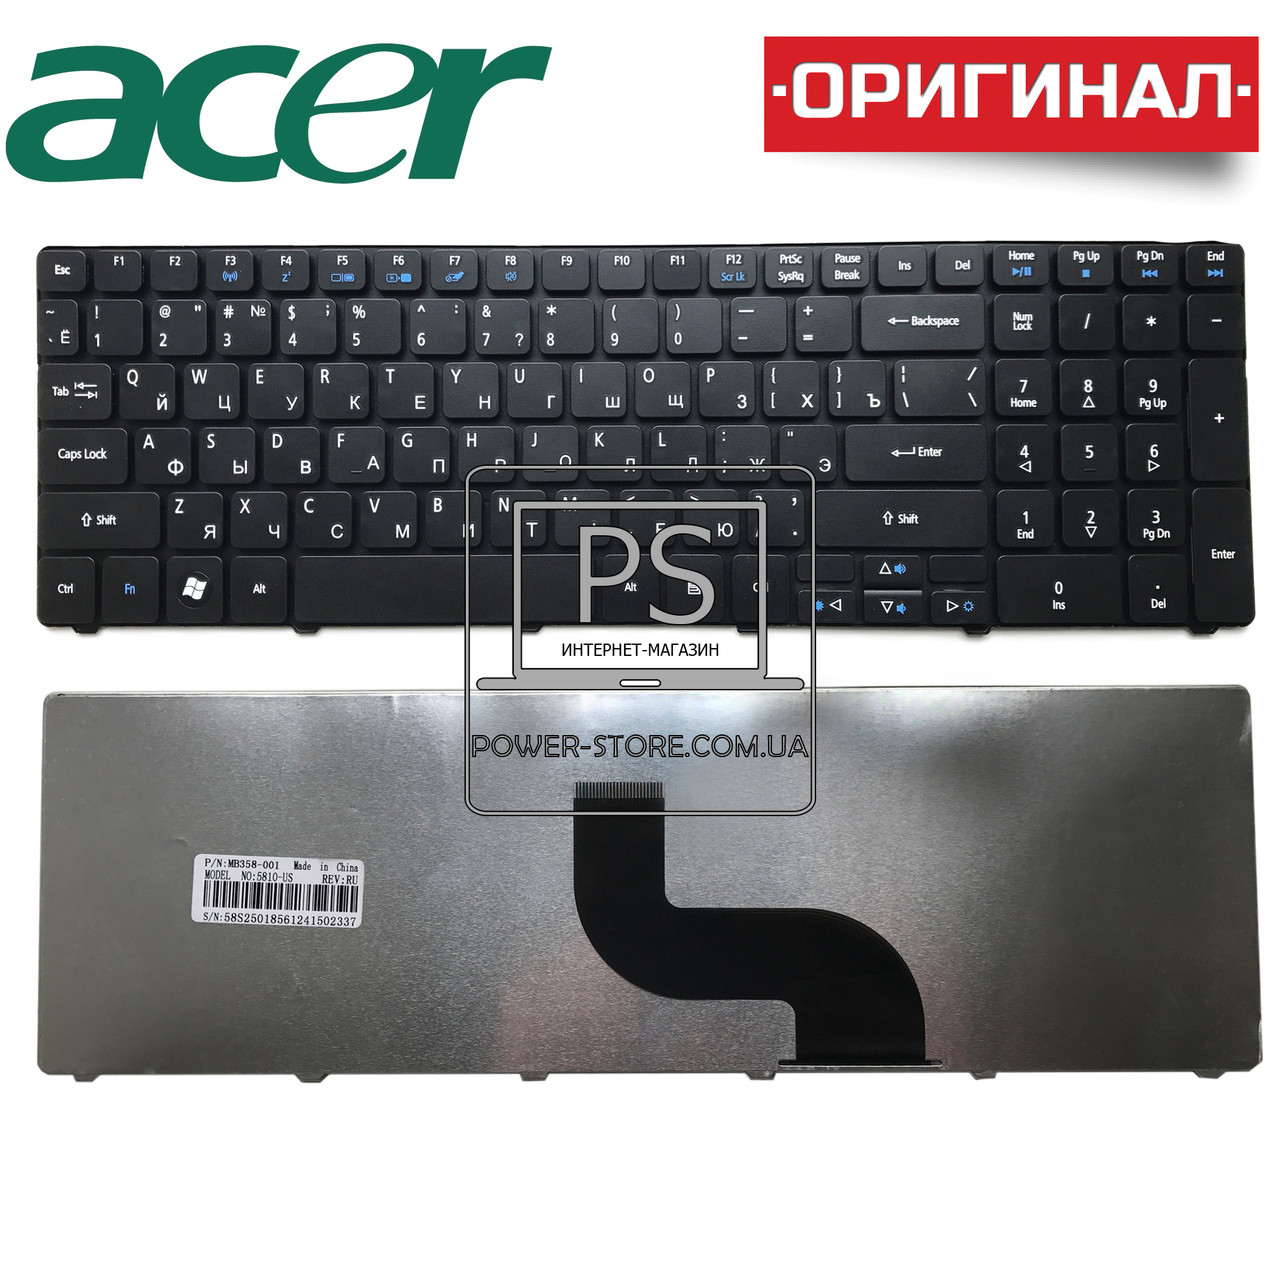 Клавиатура  для ноутбука ACER  TimeLine 5810TG, 90.4BT07.S0E, 90.4CD07.S0R, 90.4CD07.S0S,